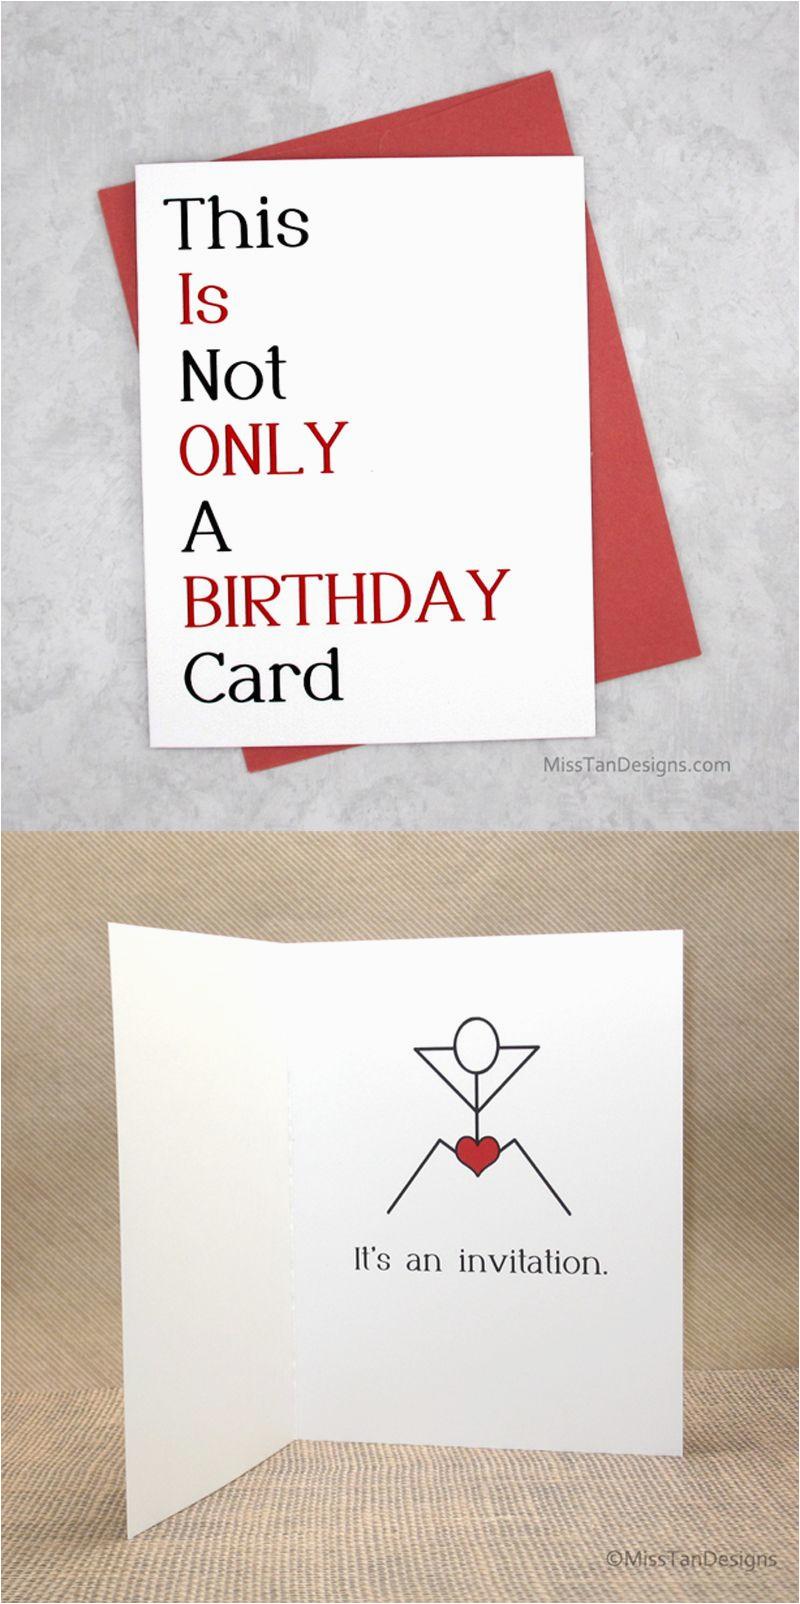 Birthday Gifts for Boyfriend Uk Boyfriend Birthday Cards Not Only Funny Gift Sexy